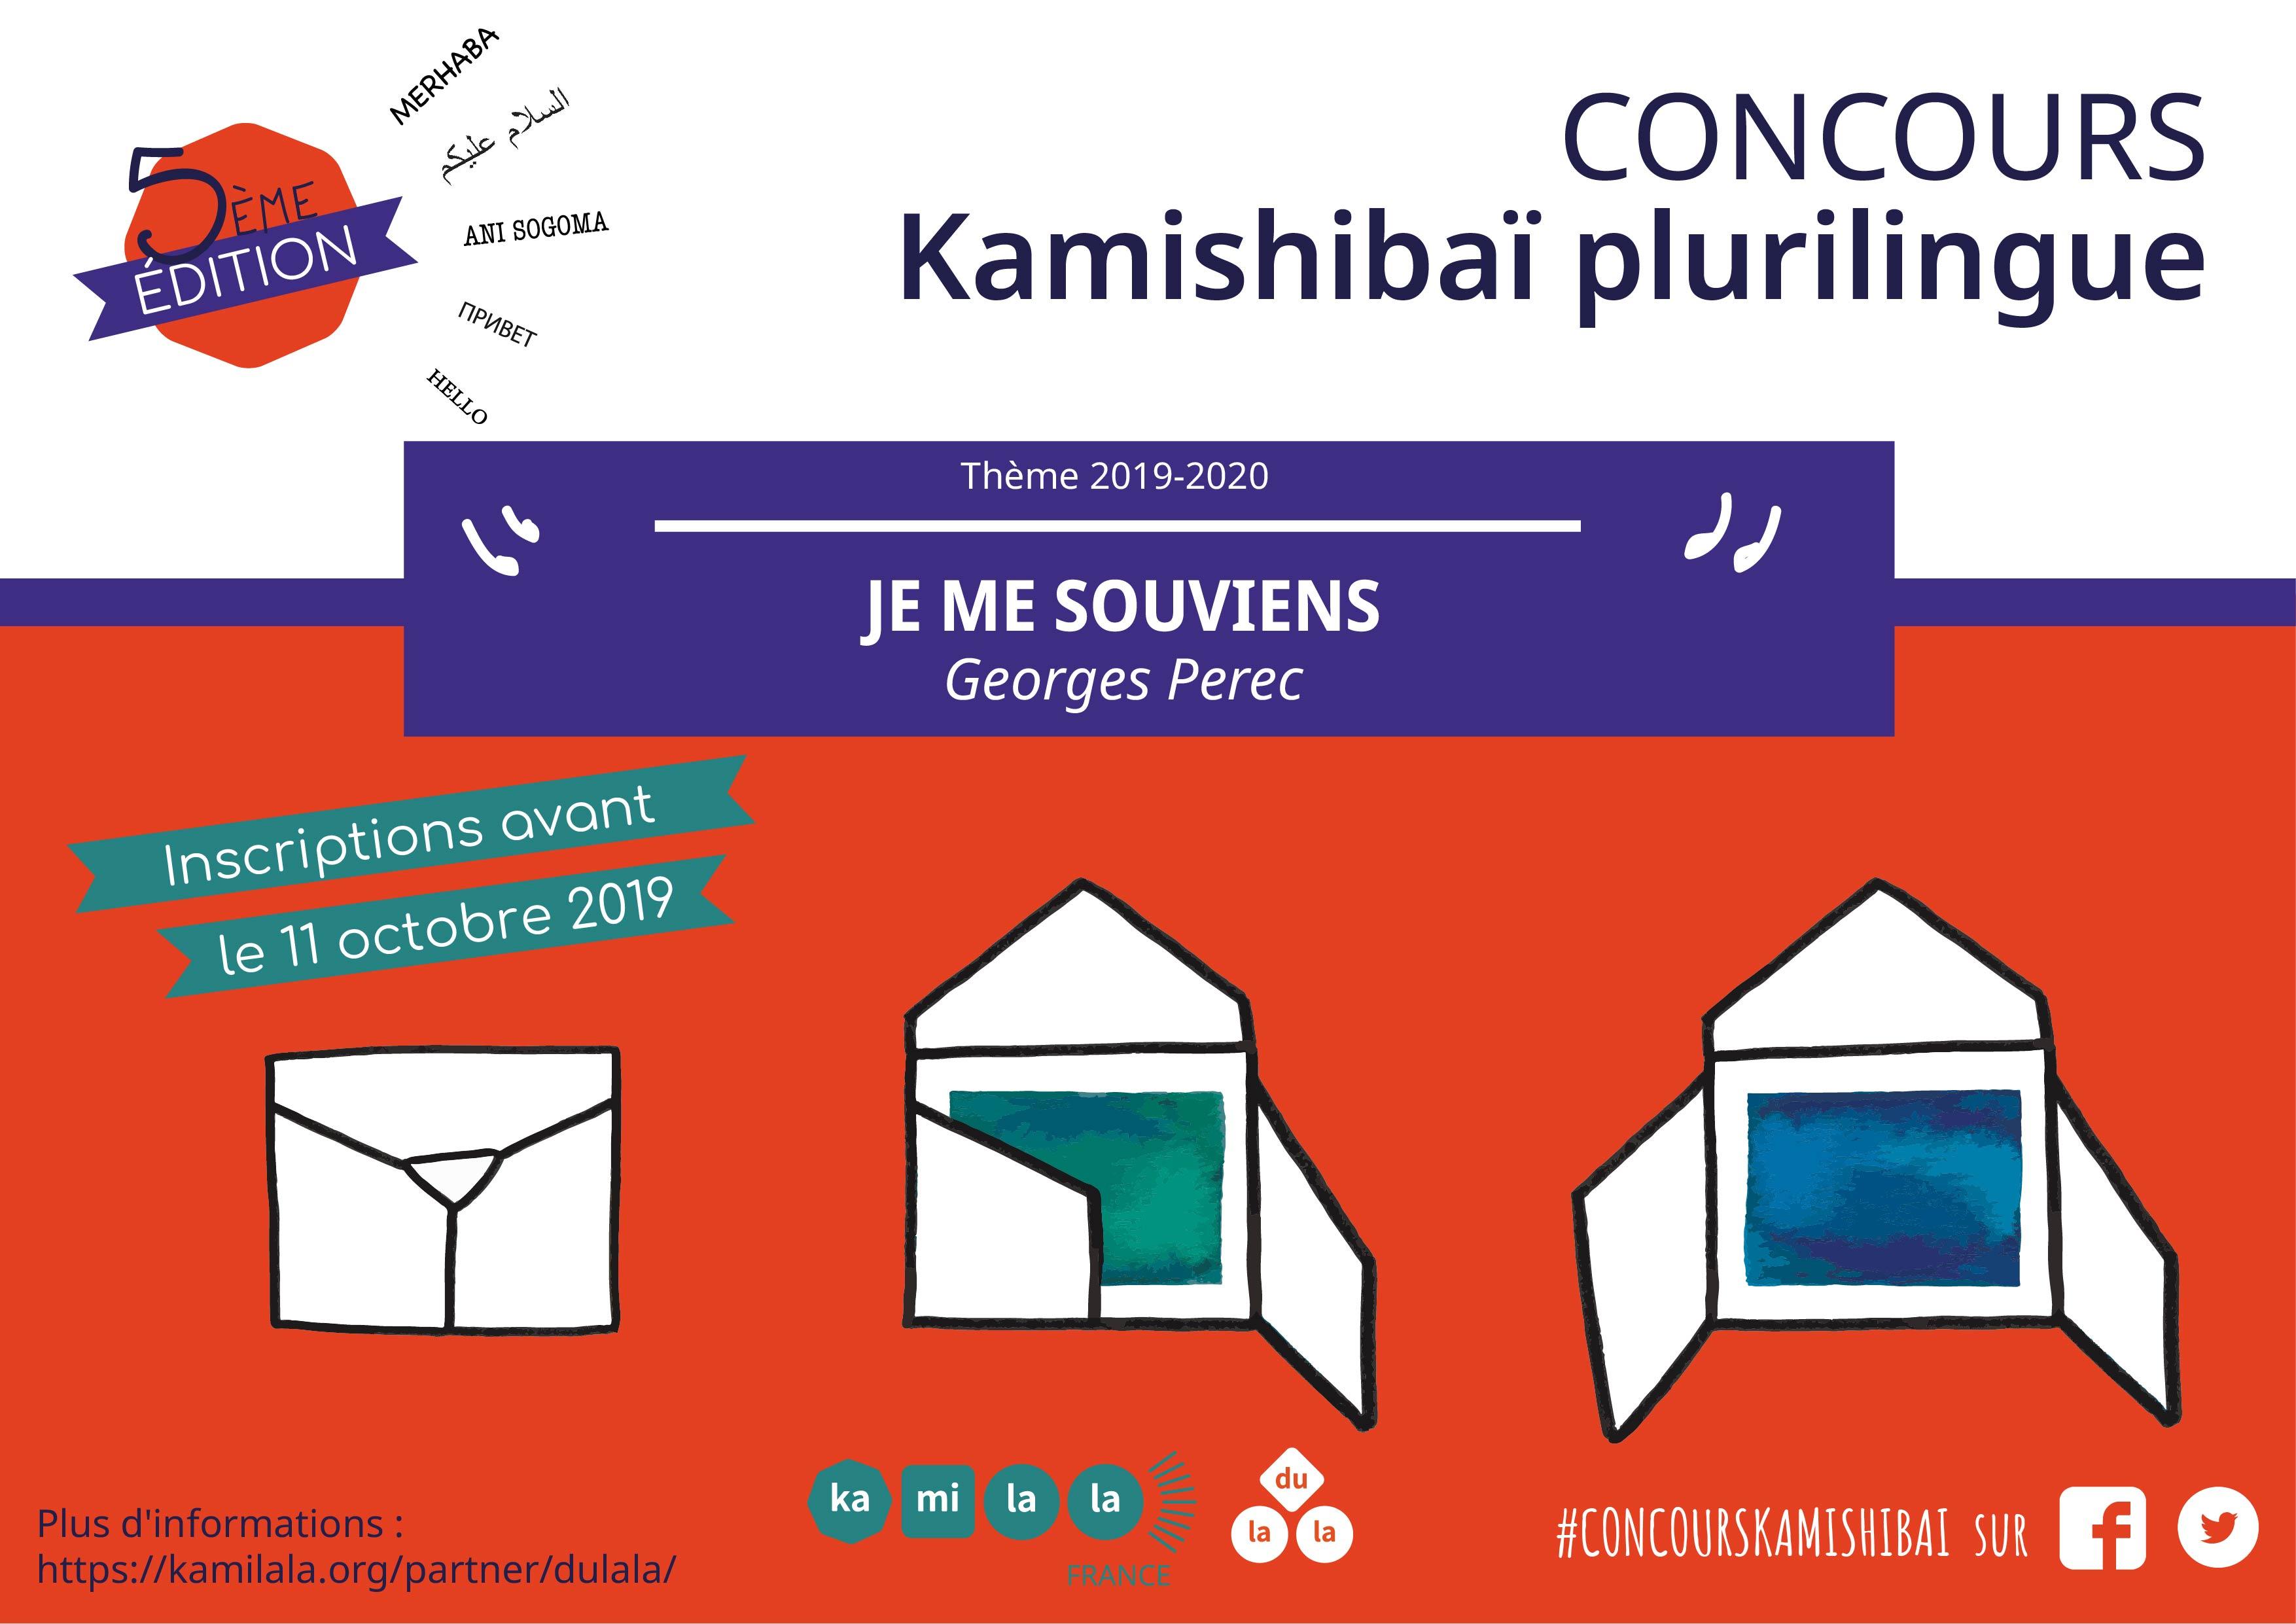 concours kamishibai dulala